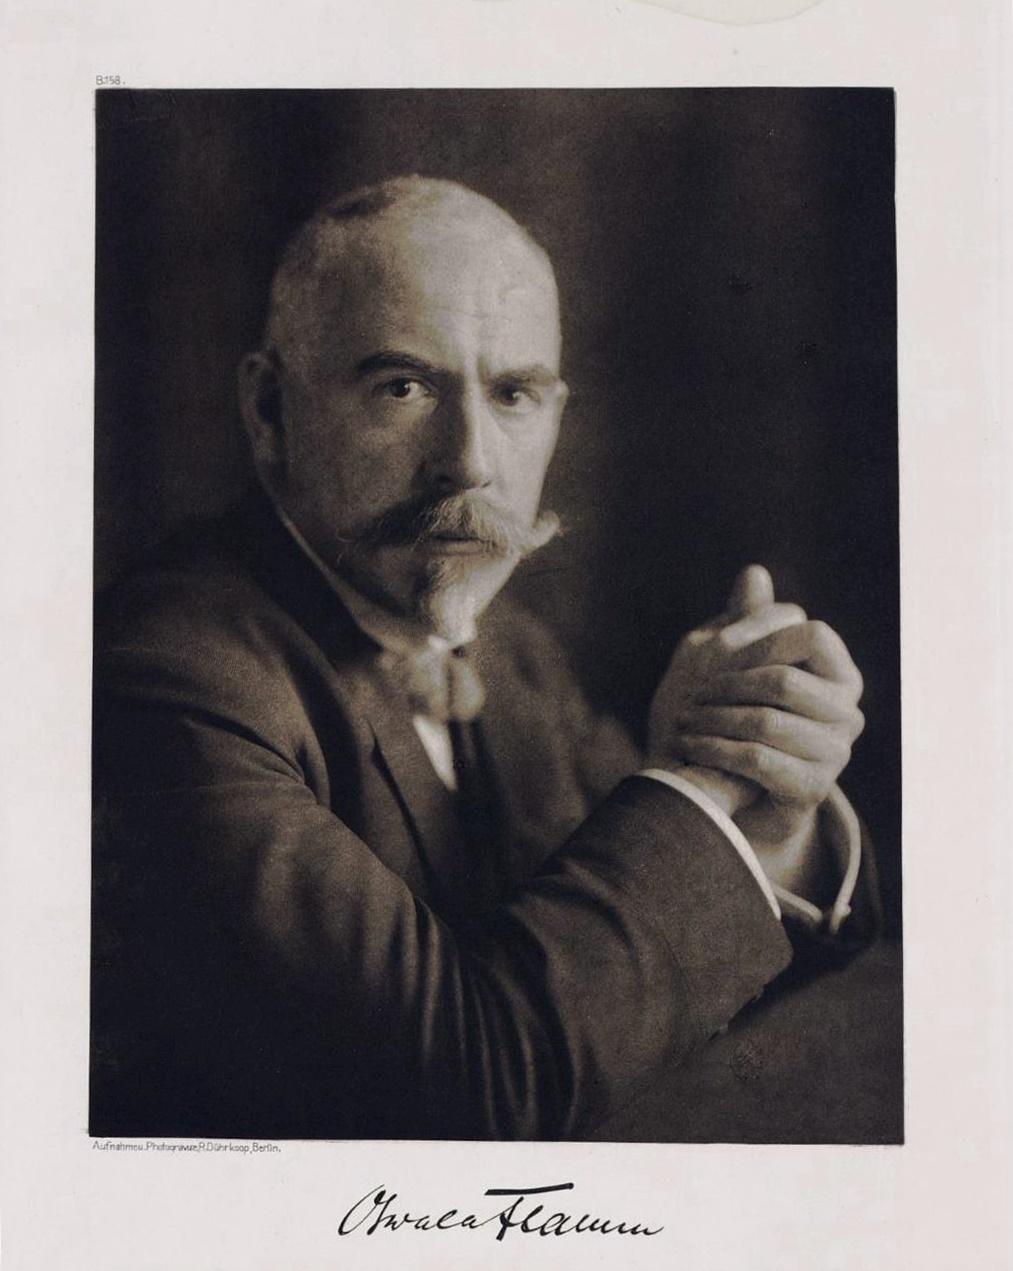 Oswald Flamm 1907